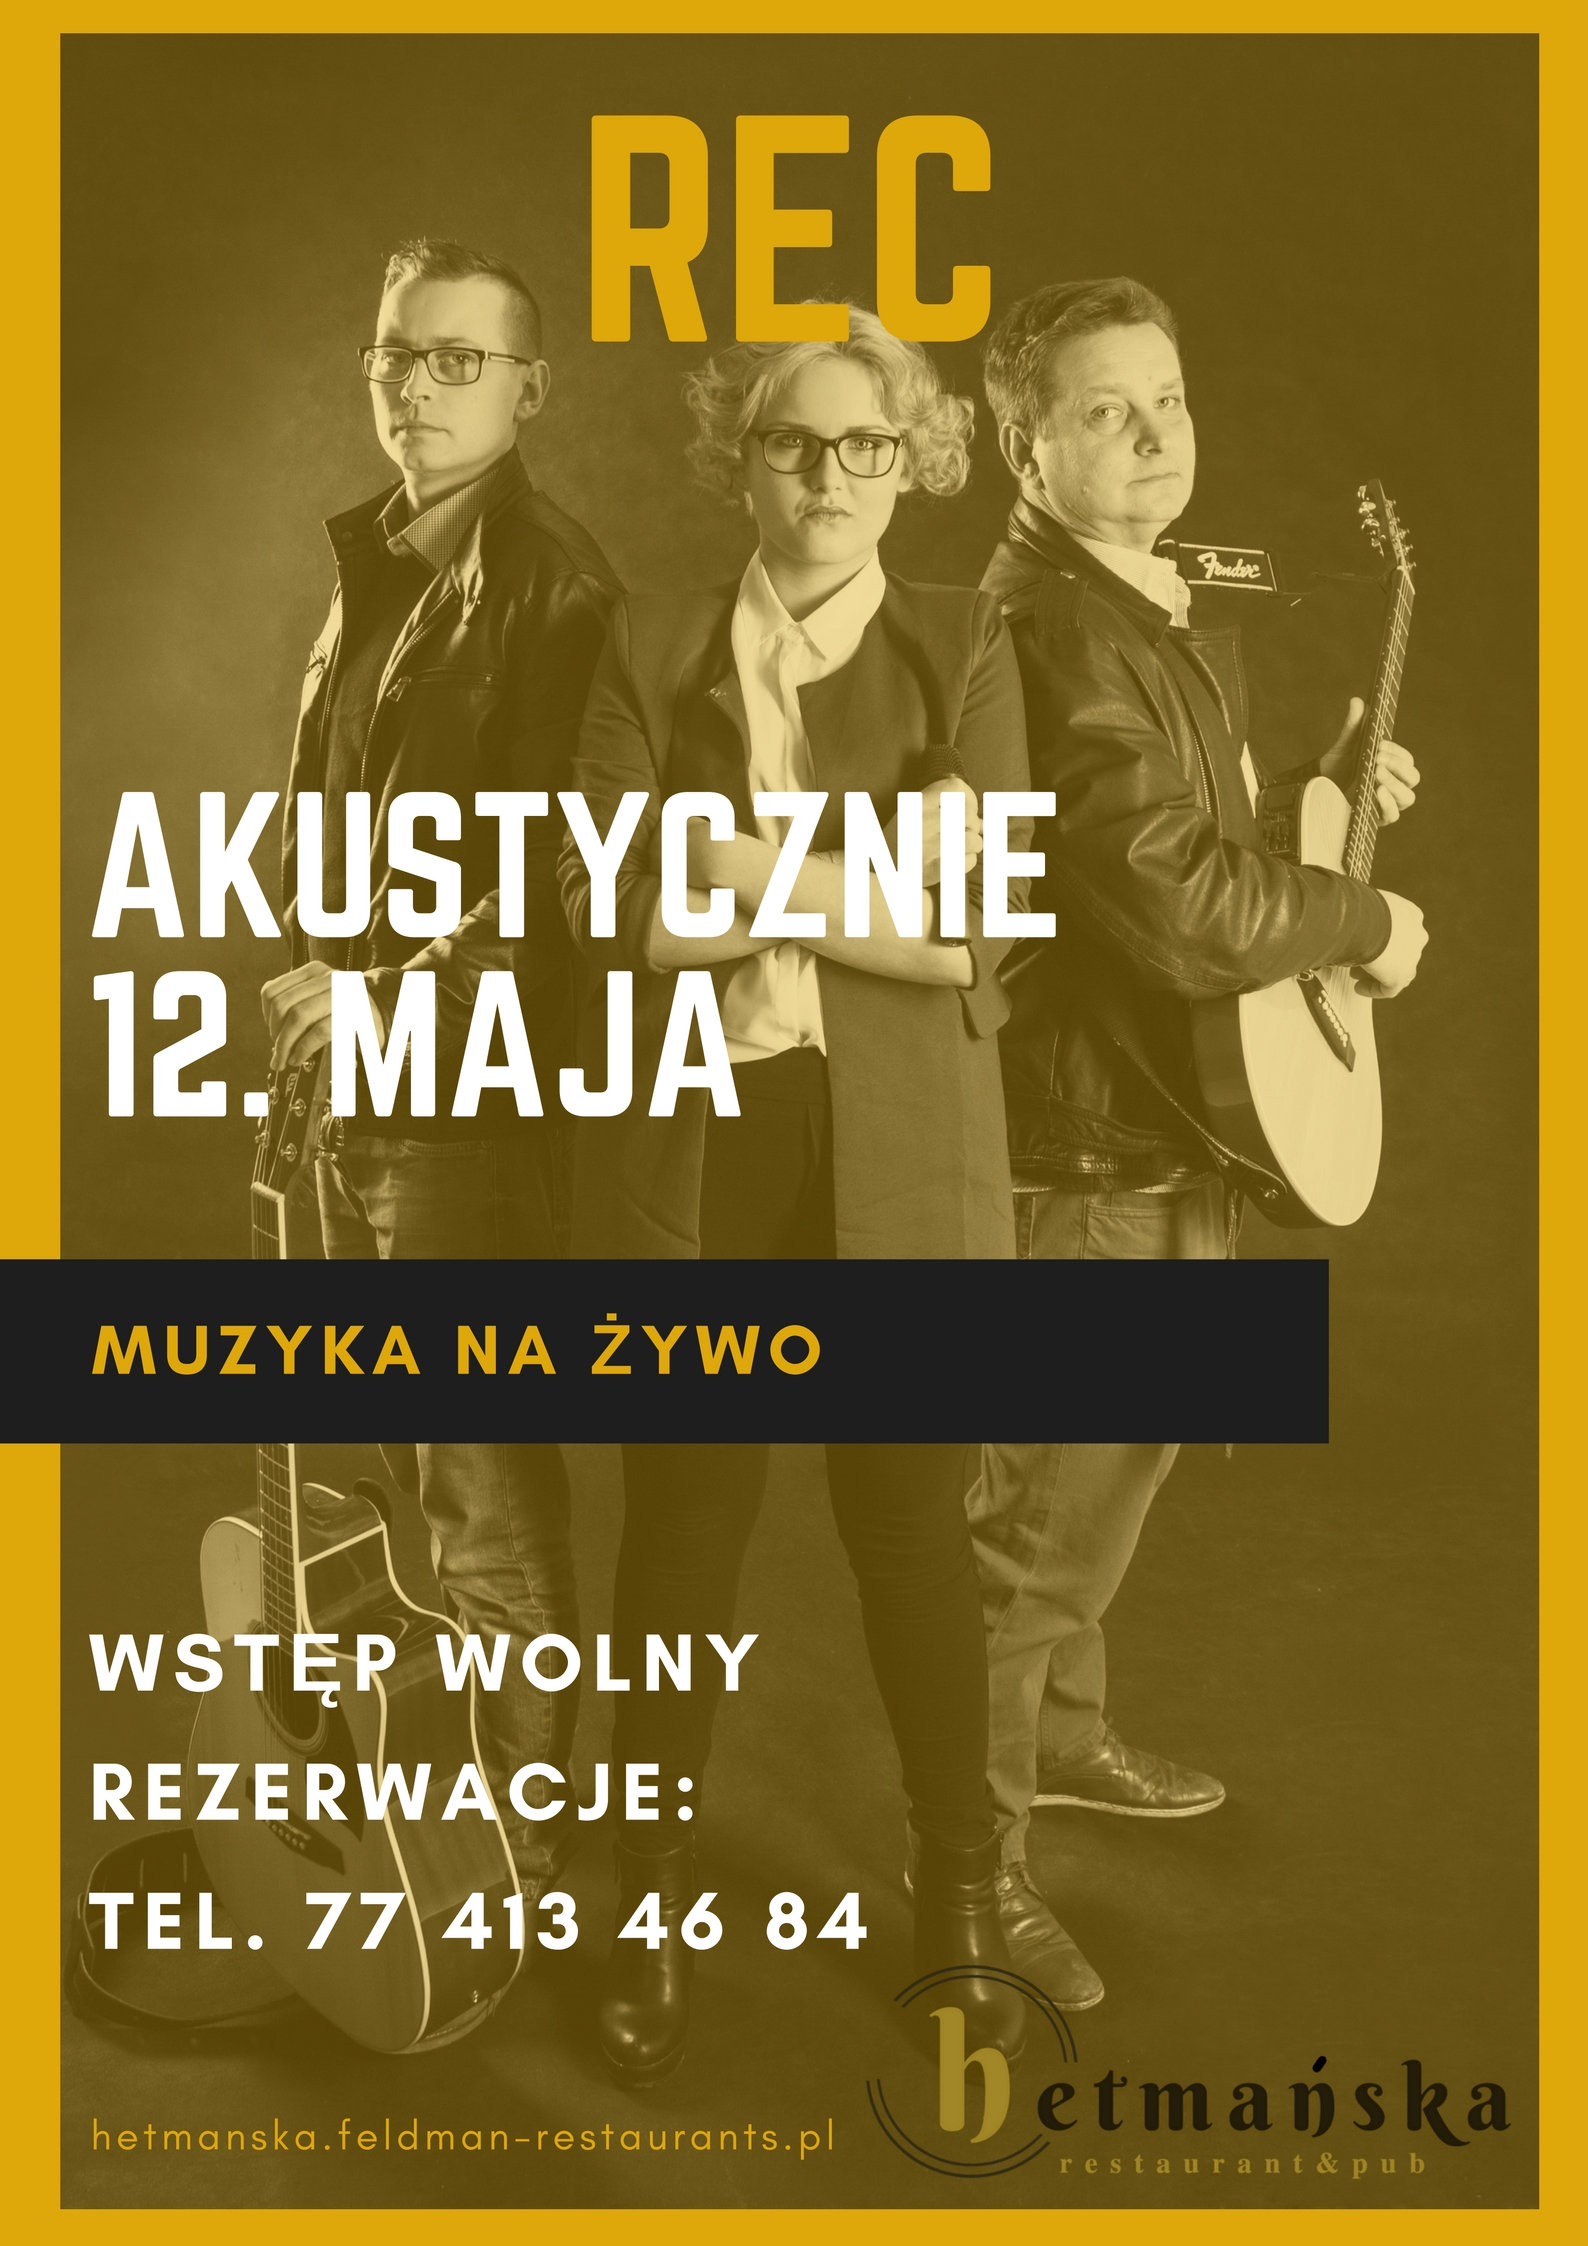 Koncert Akustyczny REC